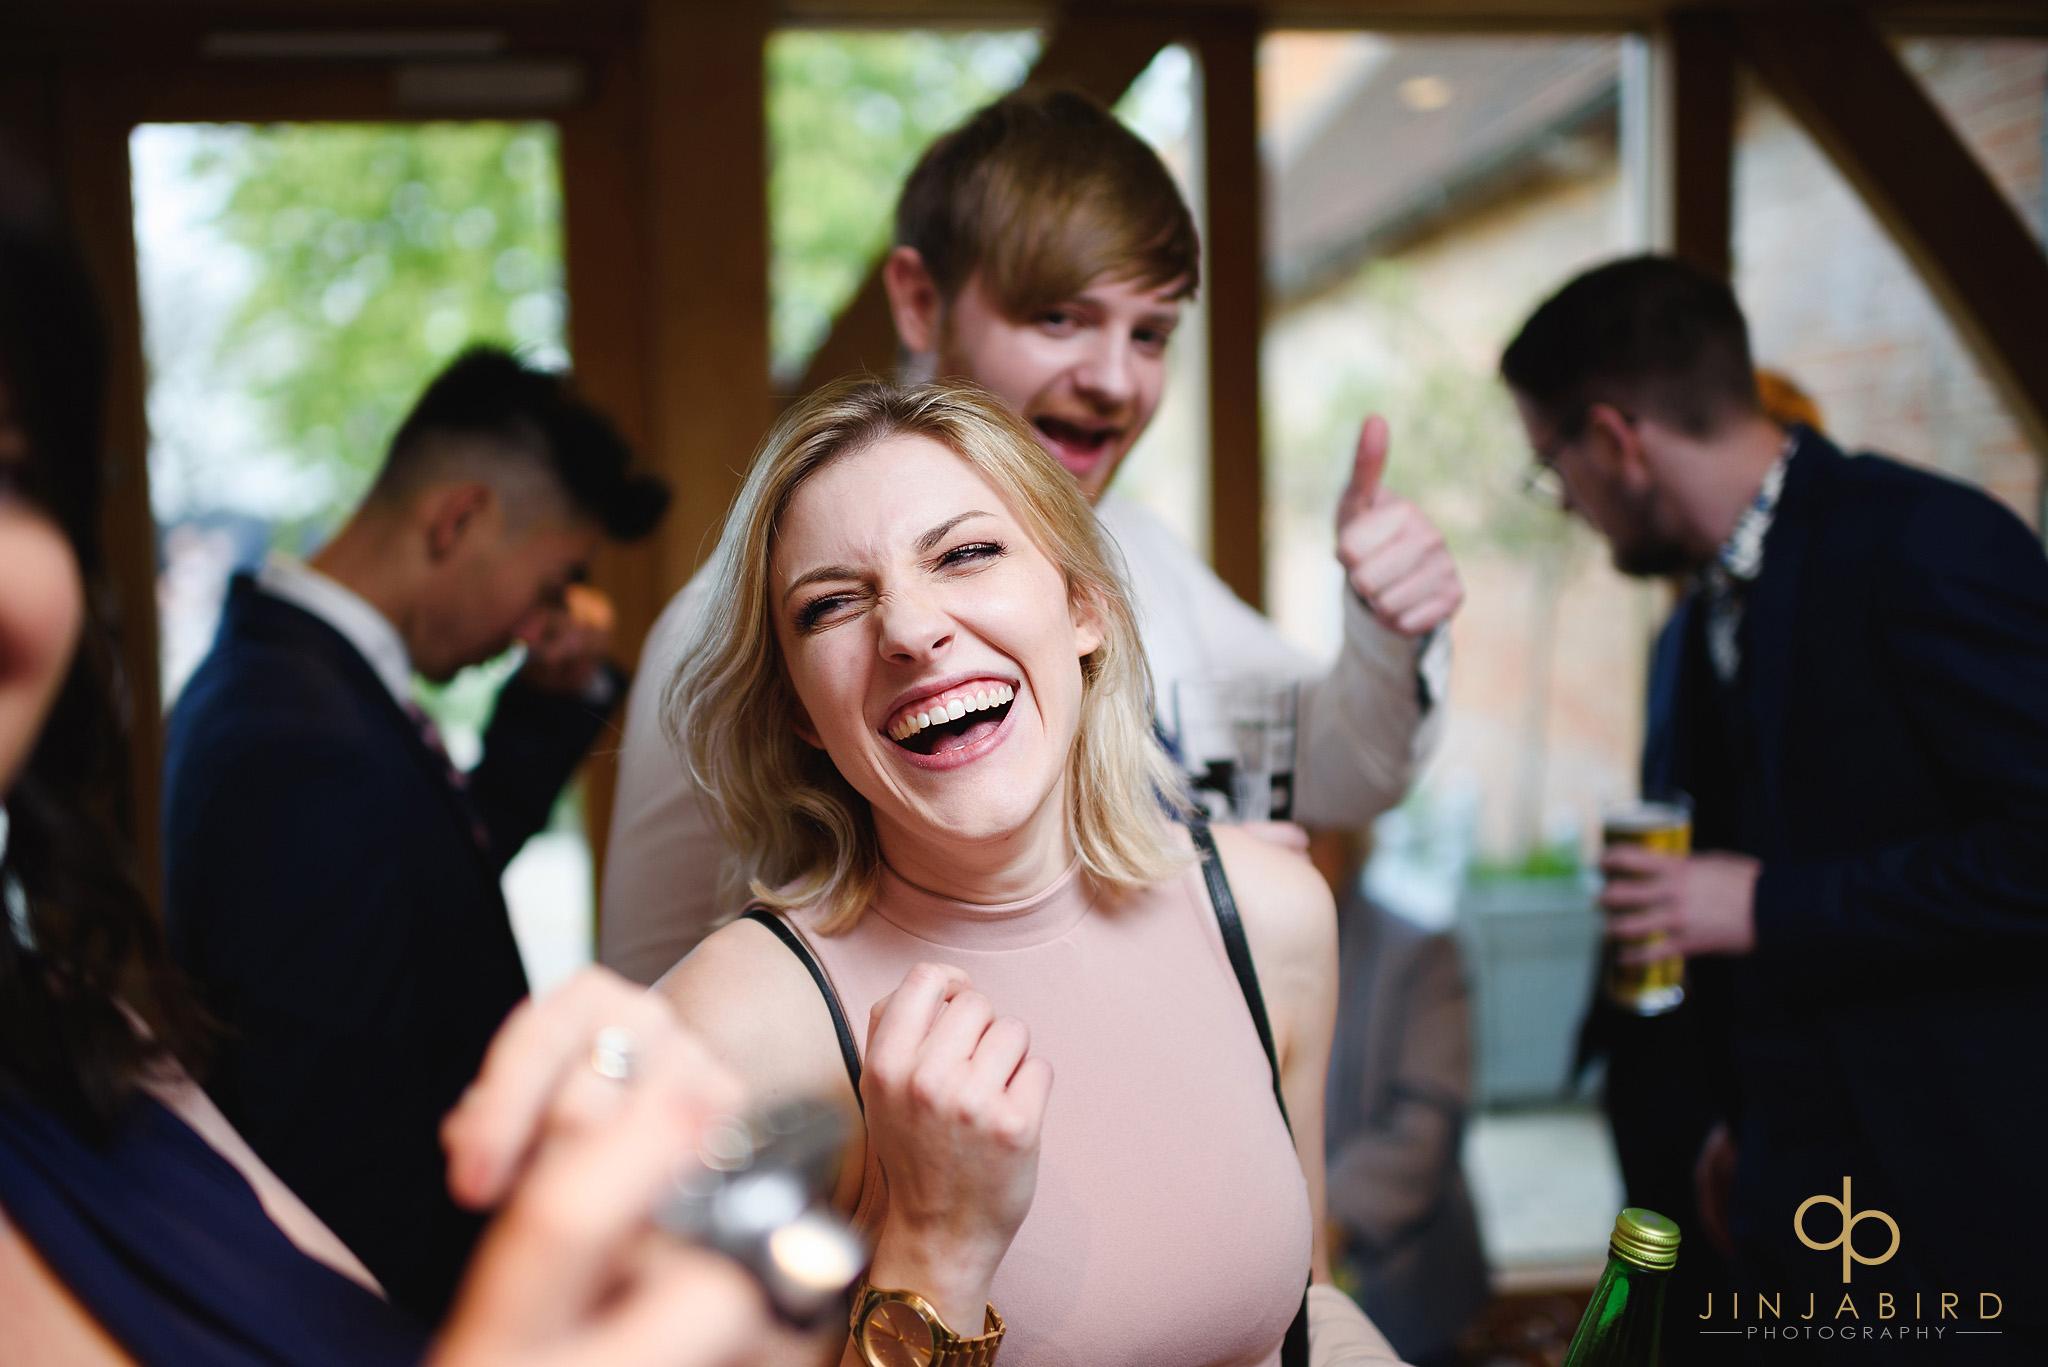 wedding guest in bar bassmead manor